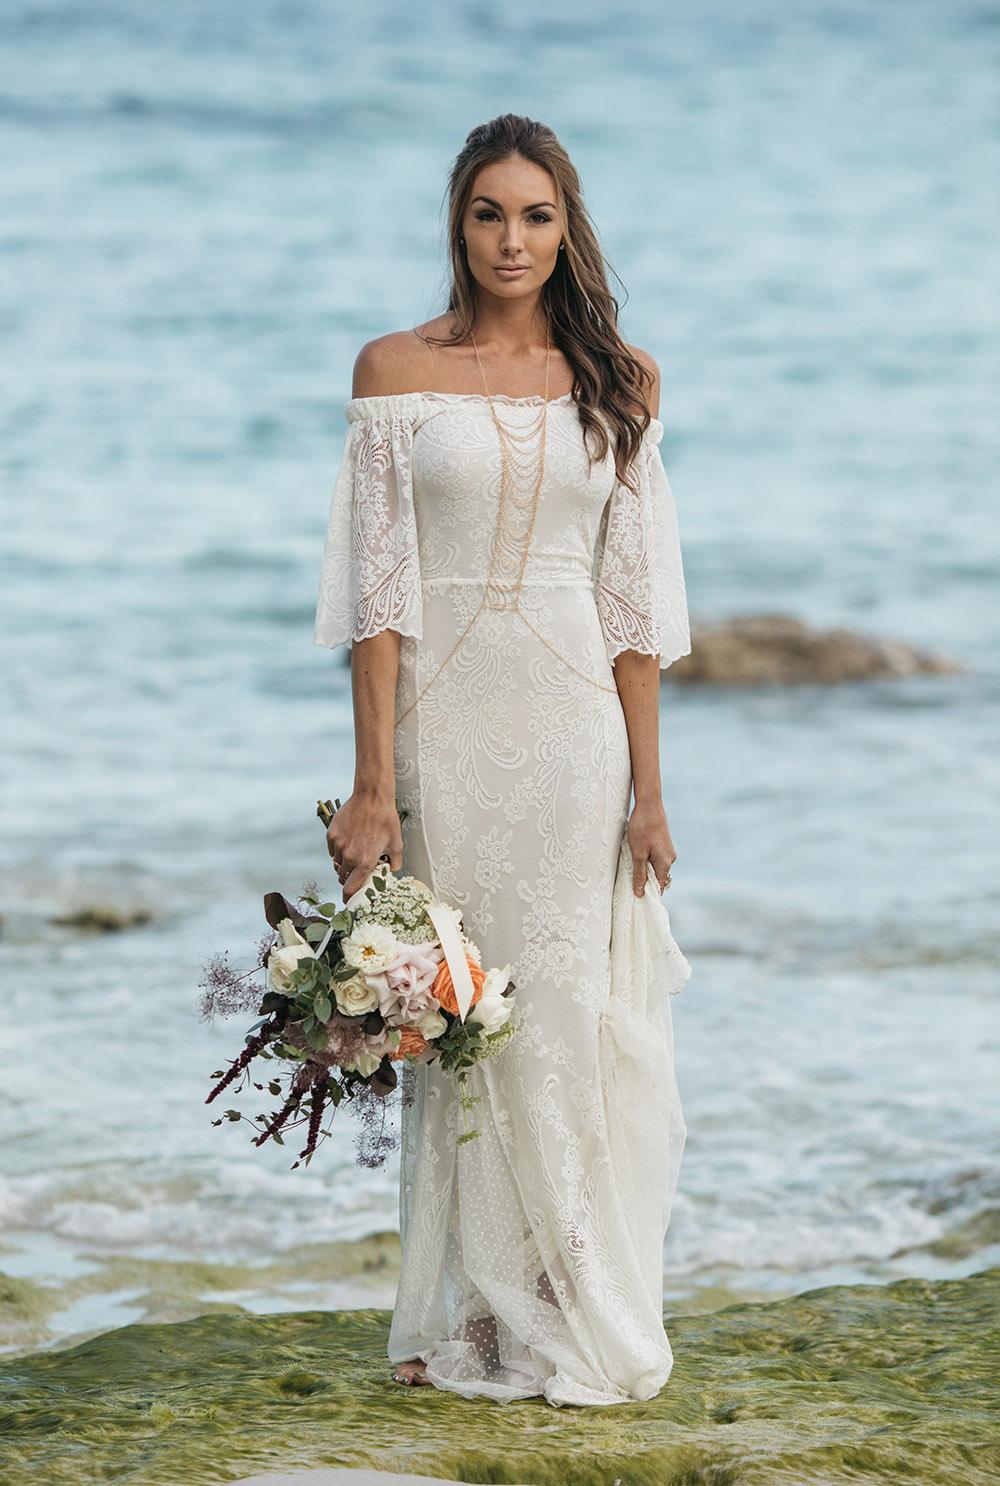 Vestidos de novia para playa ¡14 FANTÁSTICA IDEAS DE MODA! | Somos ...